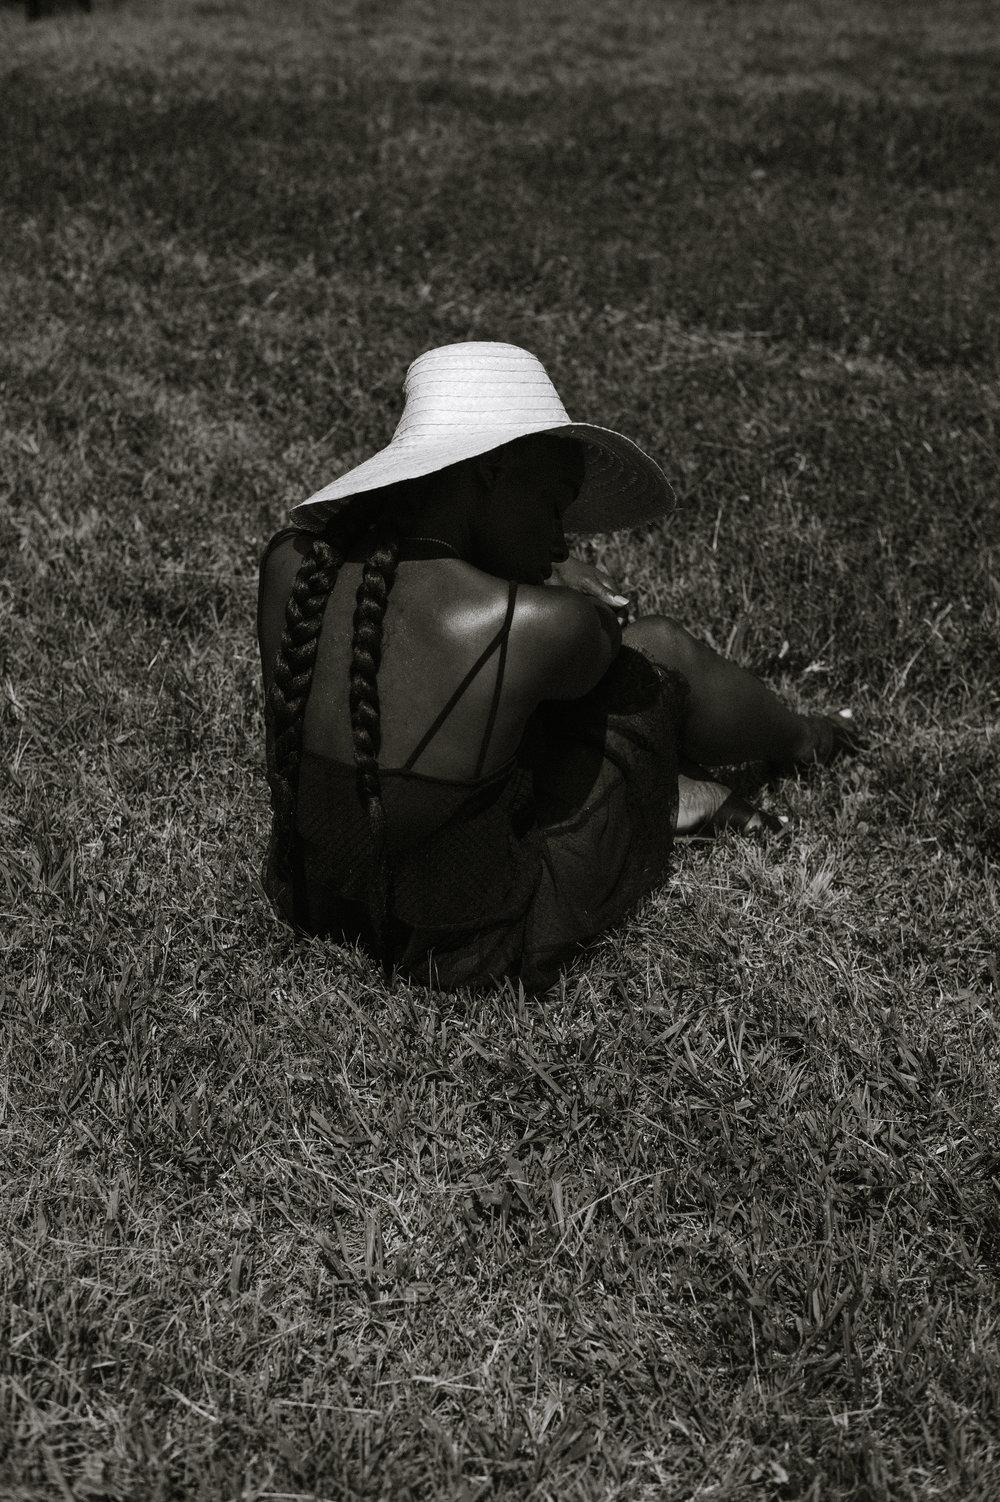 Tasha-James-The-Glossier-Blogger-Fashion-Style-HM-Lace-Dress-Black-40.jpg